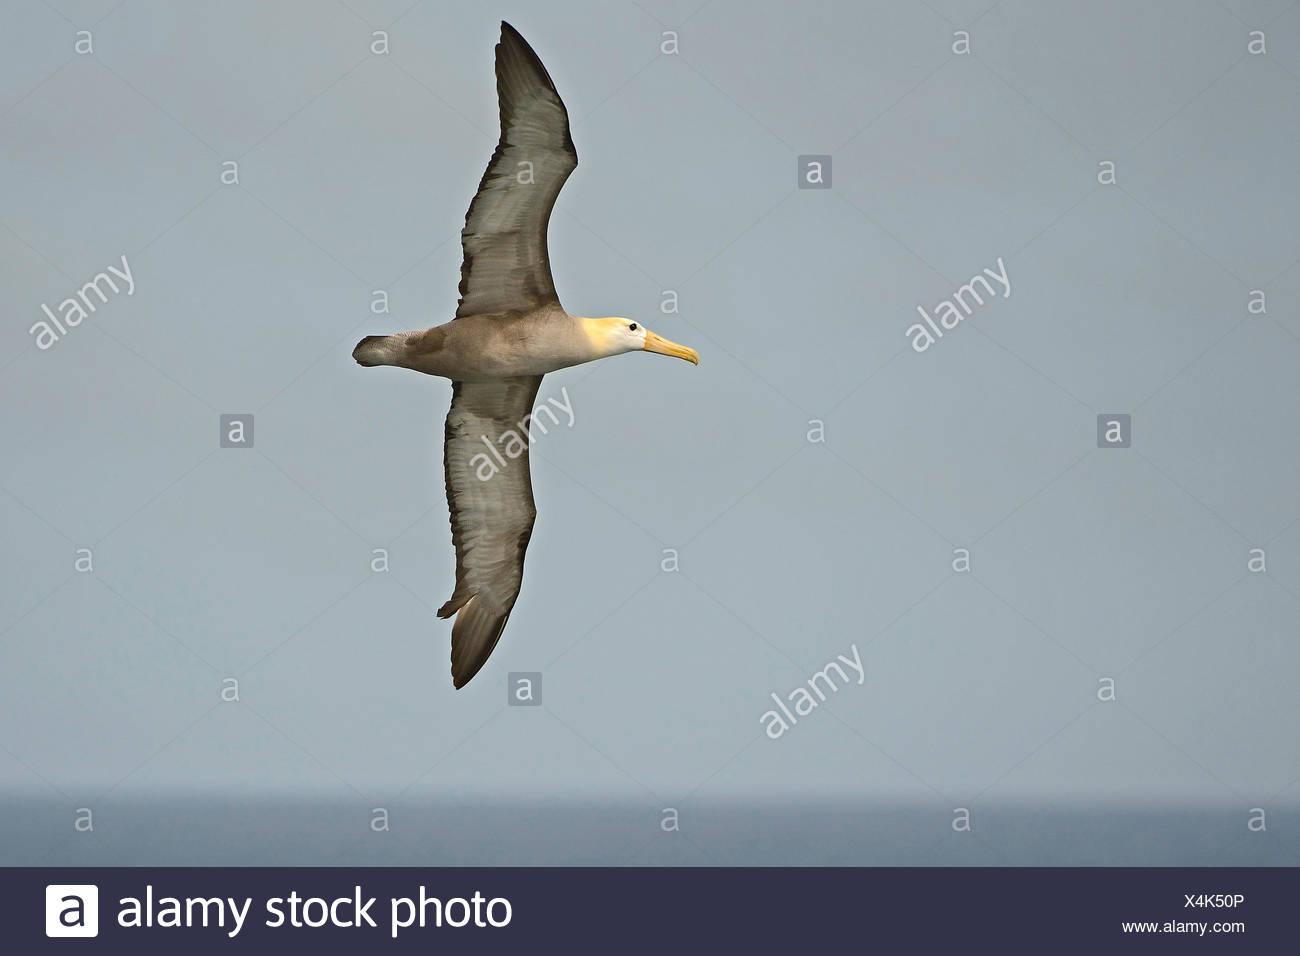 Galapagosalbatros, Galapagos-Albatros (Diomedea irrorata, Phoebastria irrorata), im Flug, Ecuador, Galapagos-Inseln, Espanola |  - Stock Image